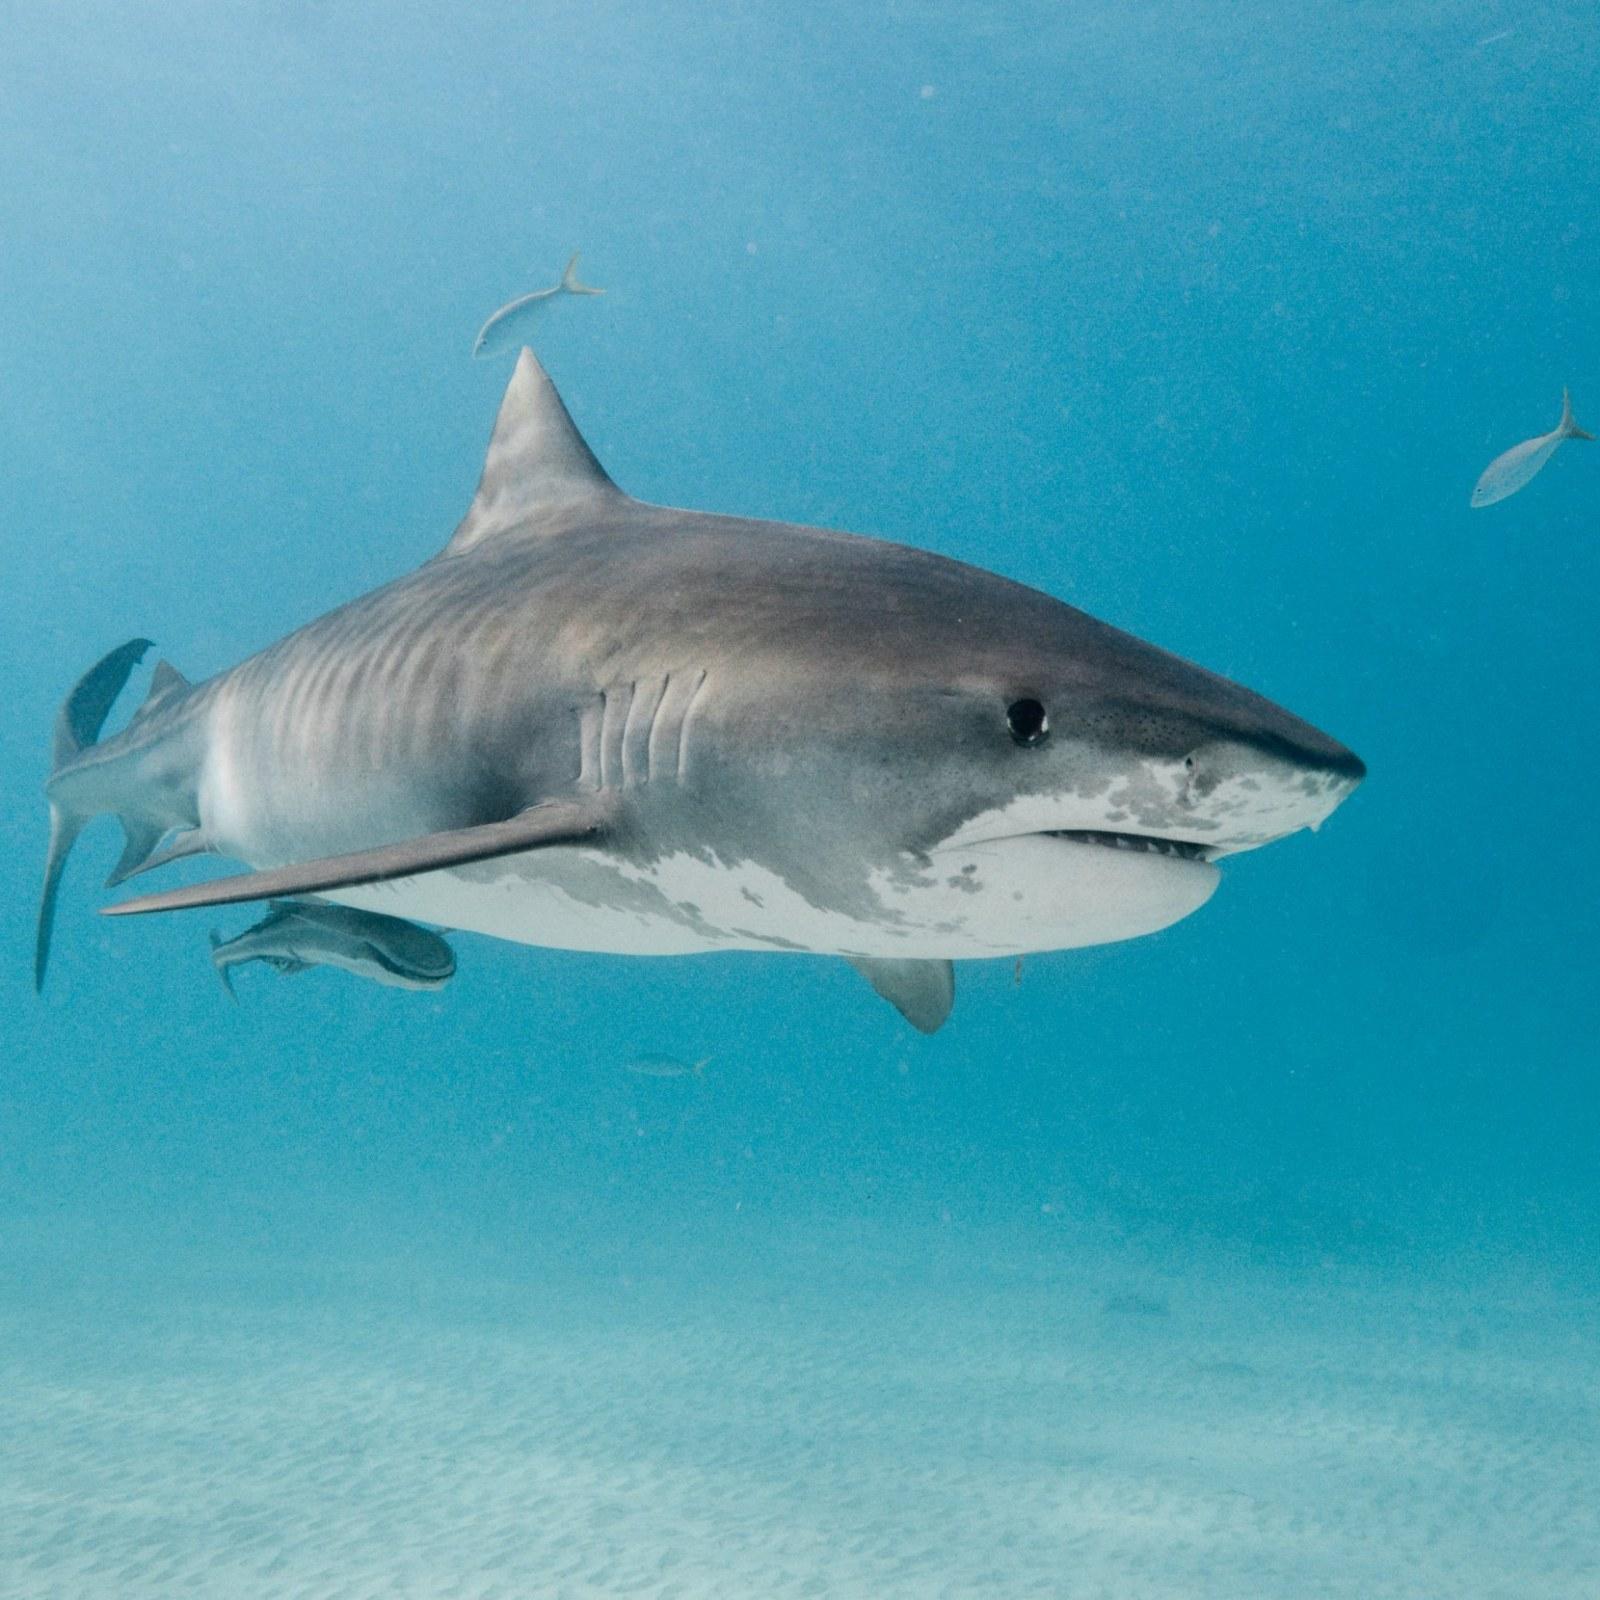 Florida's Fishing Instagram Star Shares Viral Photo of Huge